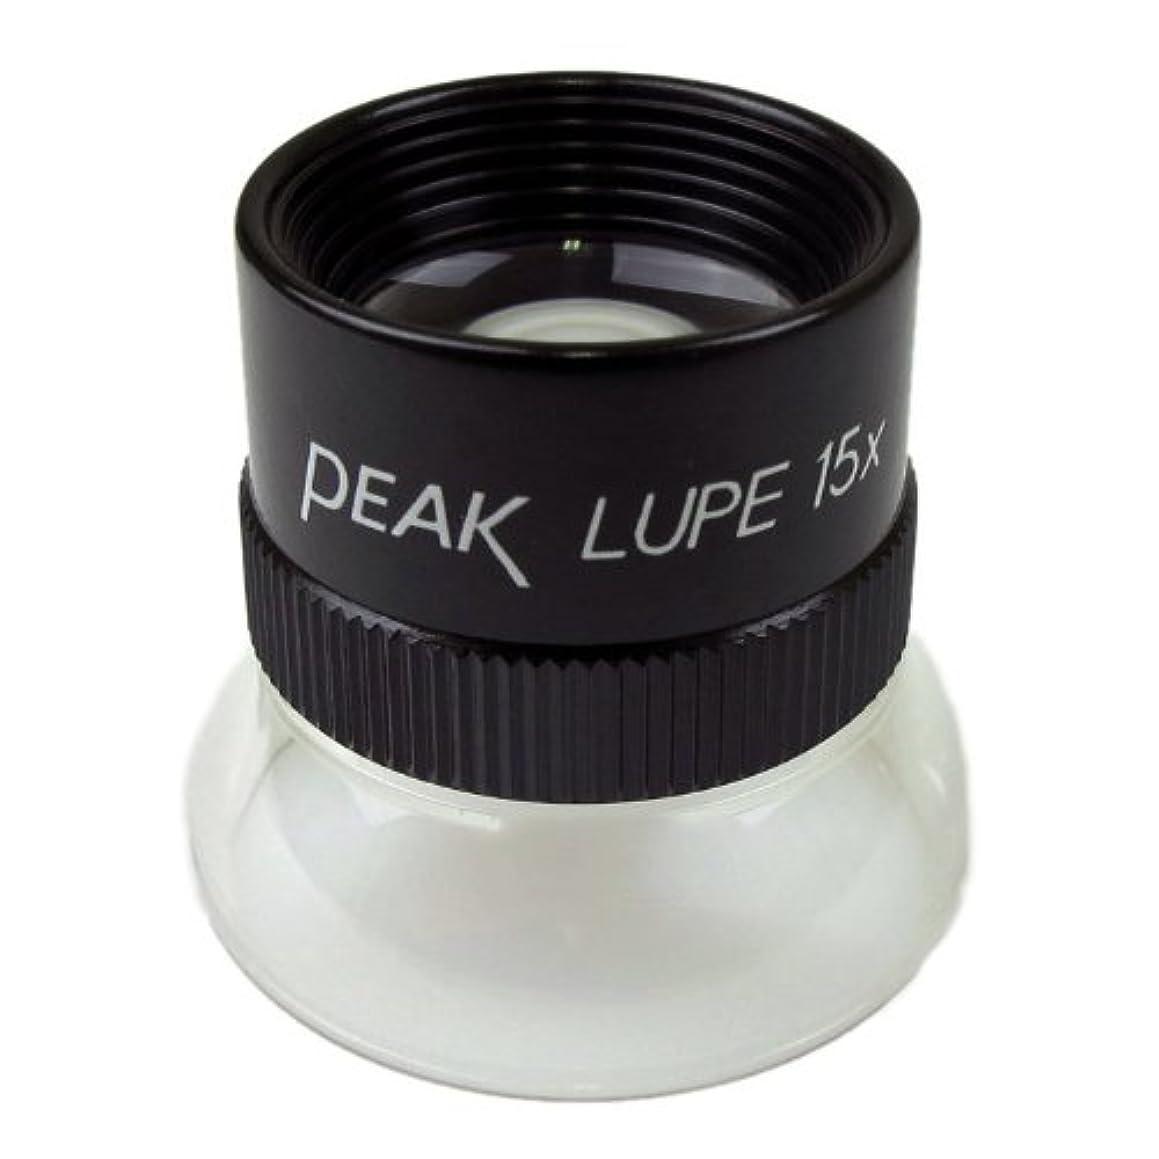 PEAK TS1962 Fixed Focus Loupe, 15X Magnification, 0.75